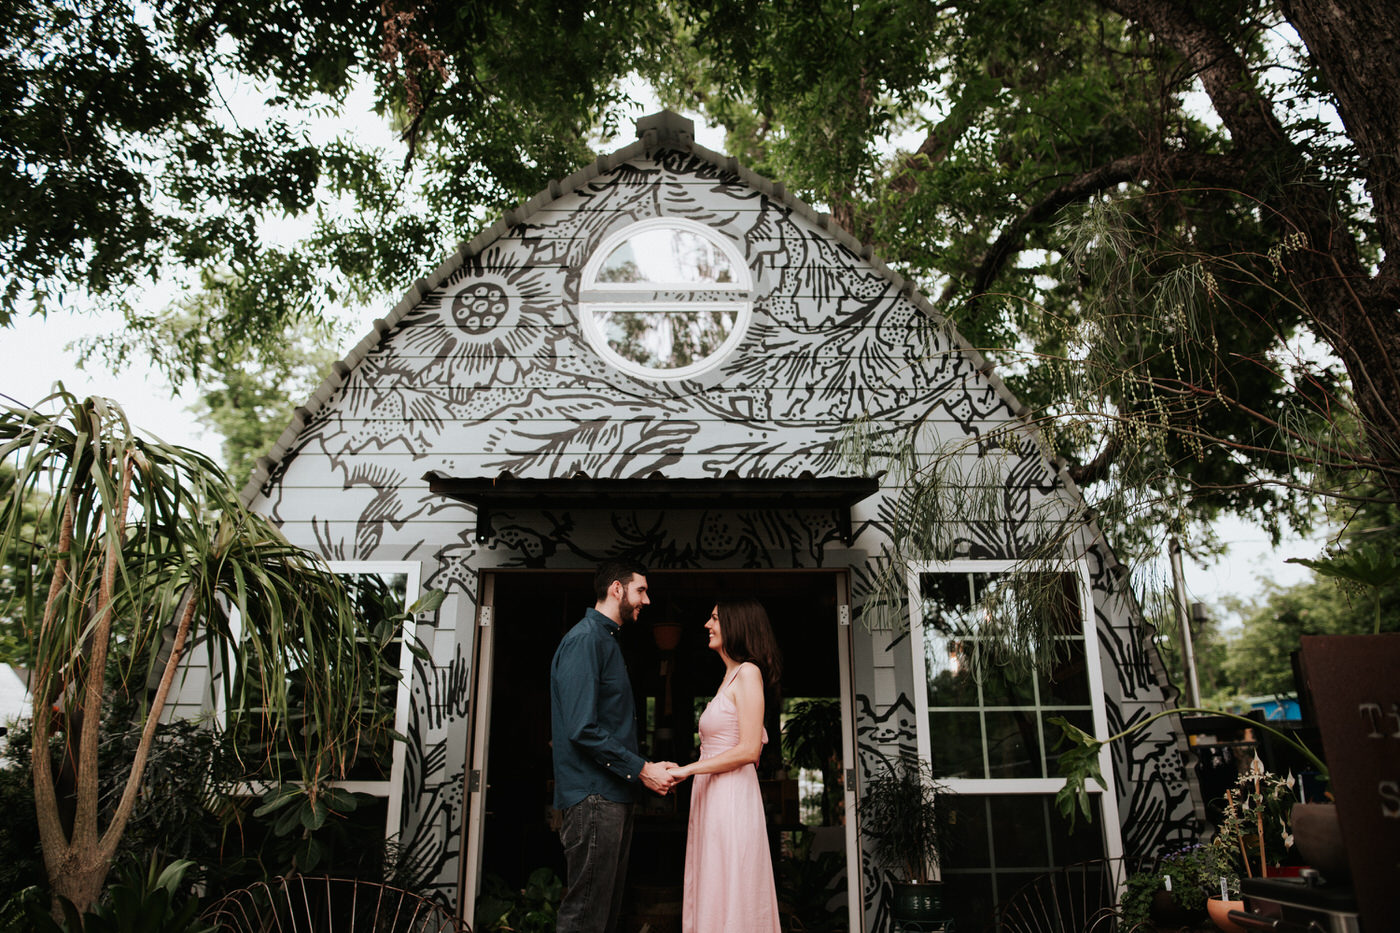 East Austin Engagement - Diana Ascarrrunz Photography -103.jpg